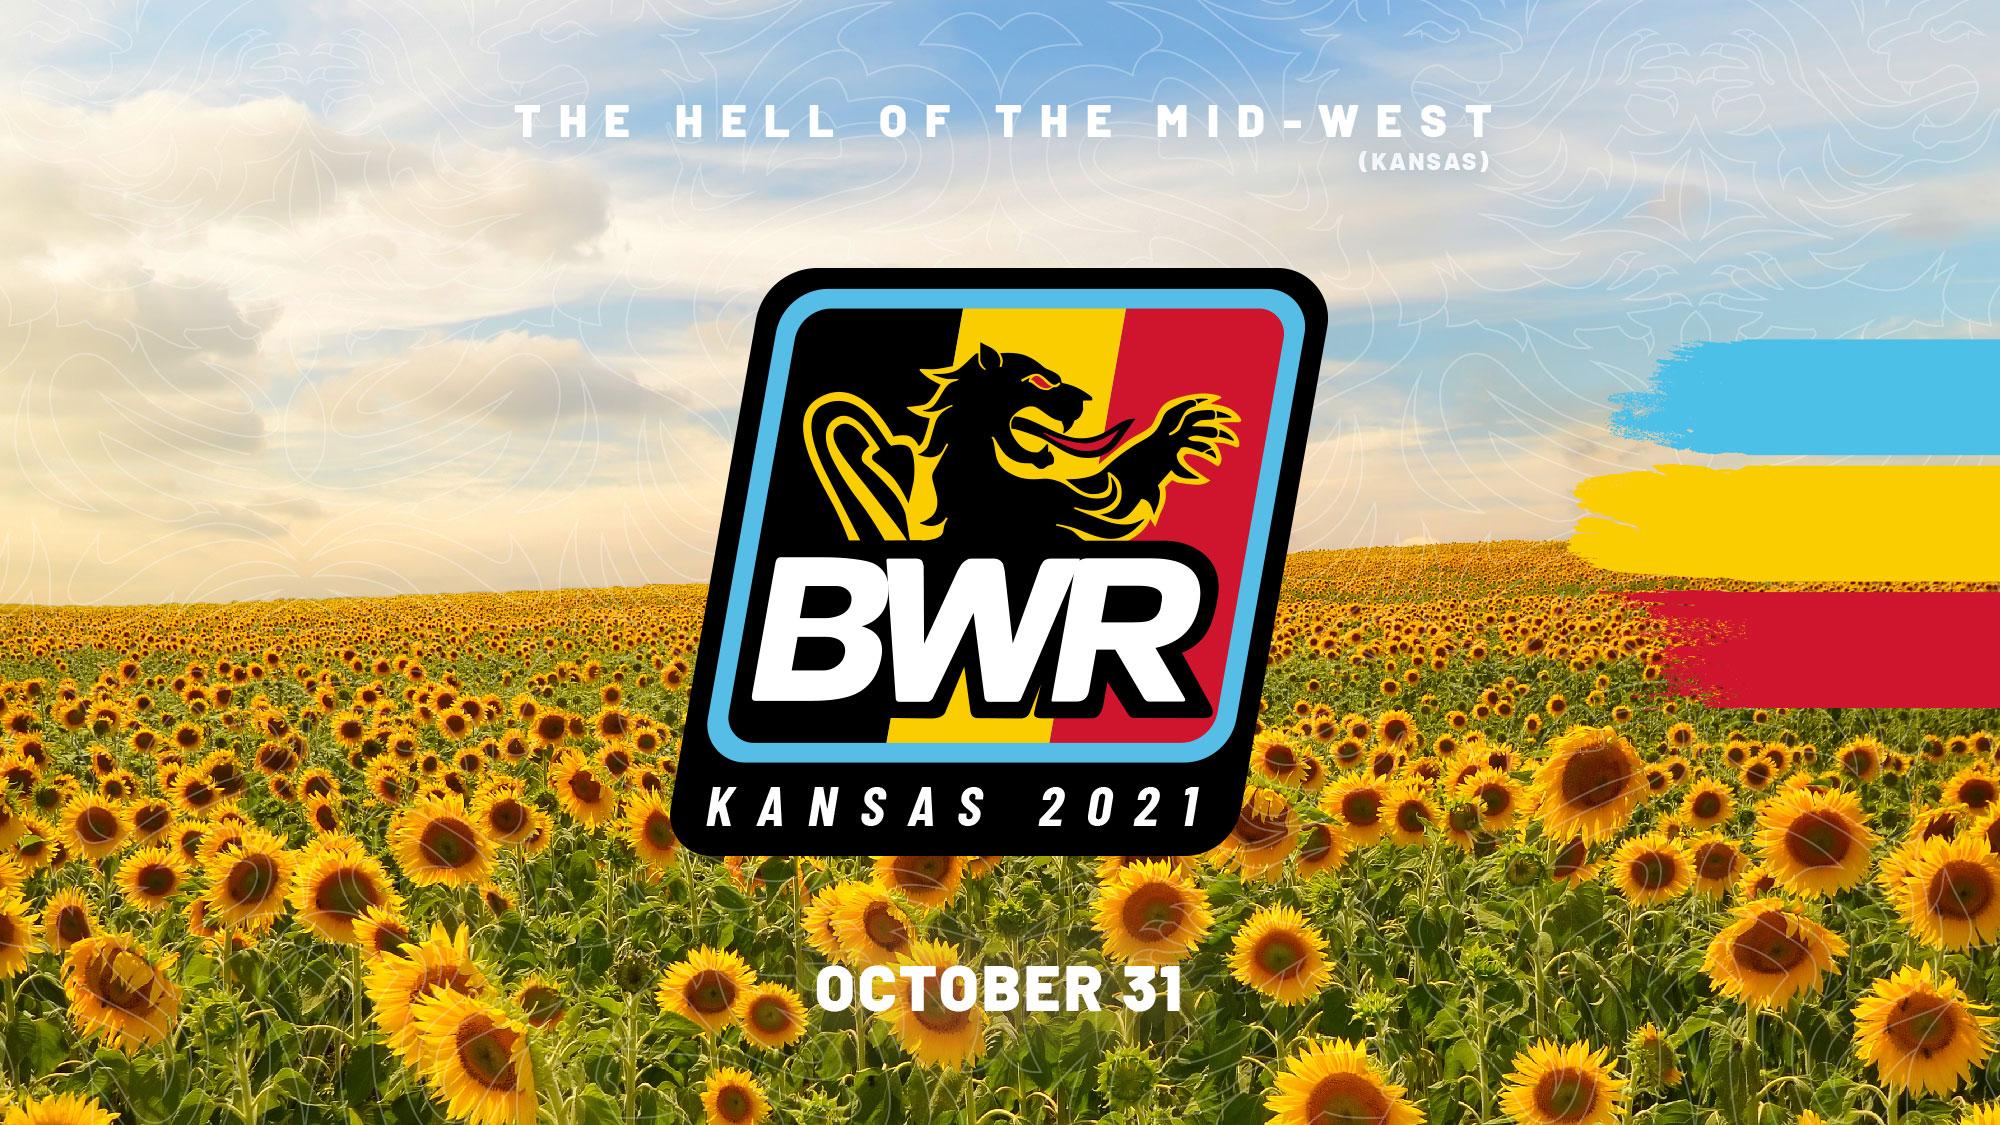 BWR Kansas 2021